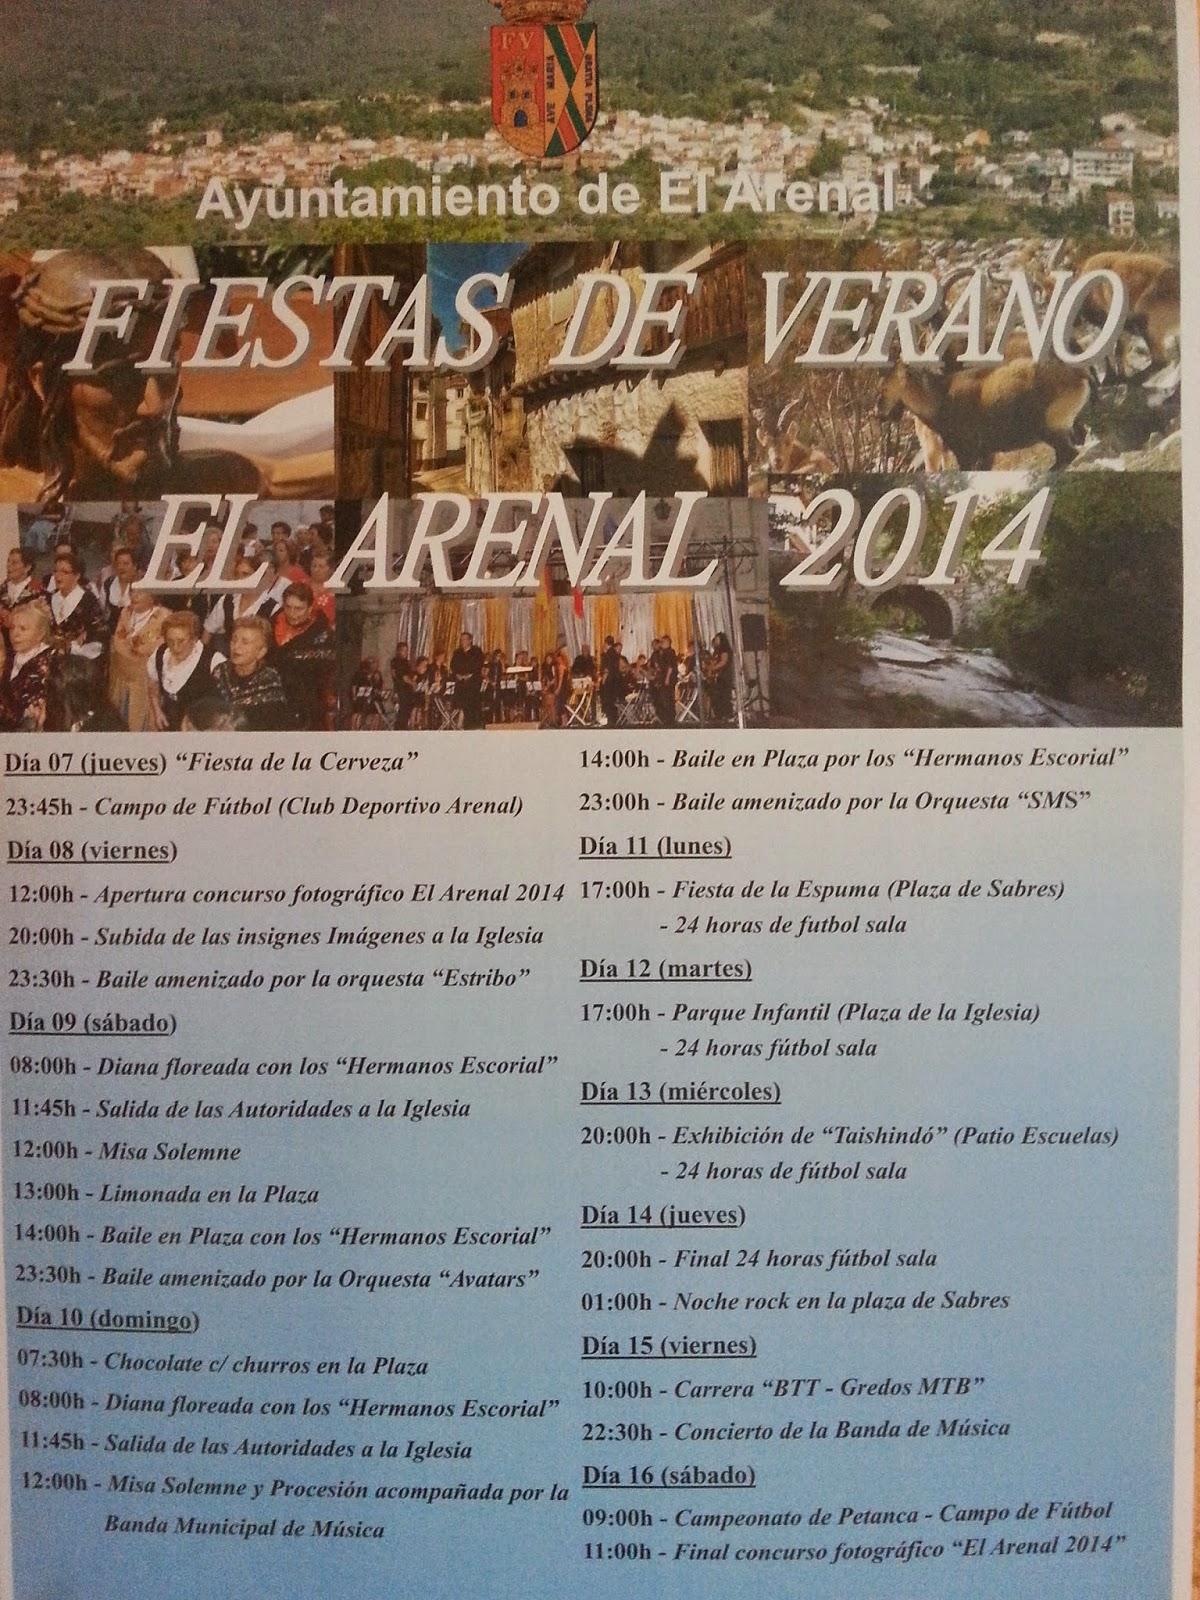 Programa de Fiestas de Verano 2014